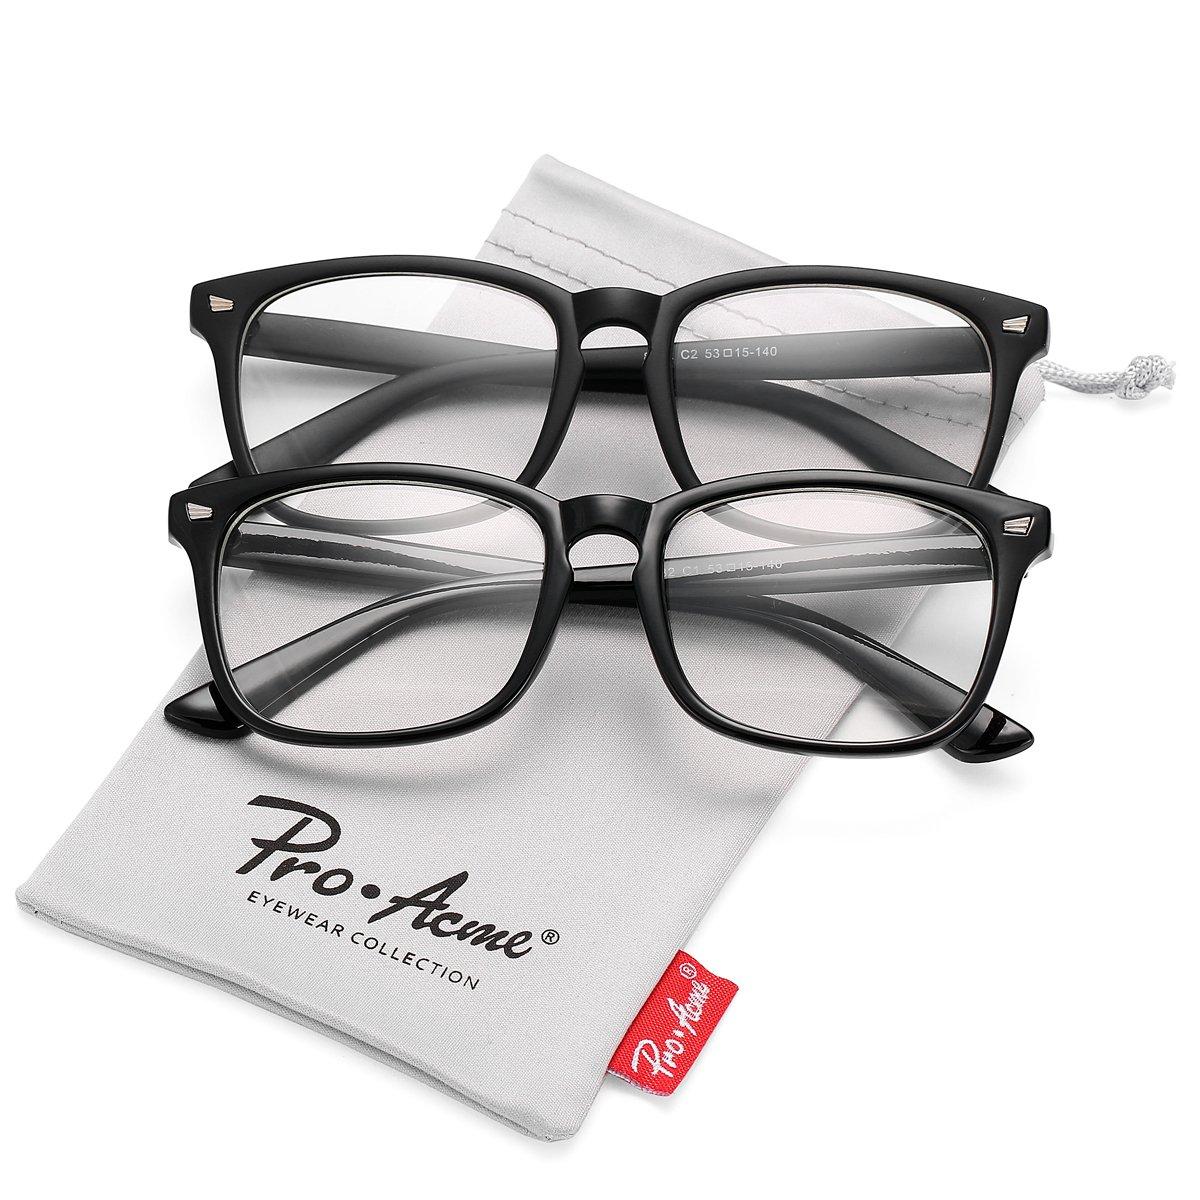 Pro Acme New Wayfarer Non-prescription Glasses Frame Clear Lens Eyeglasses (Black + Matte Black)